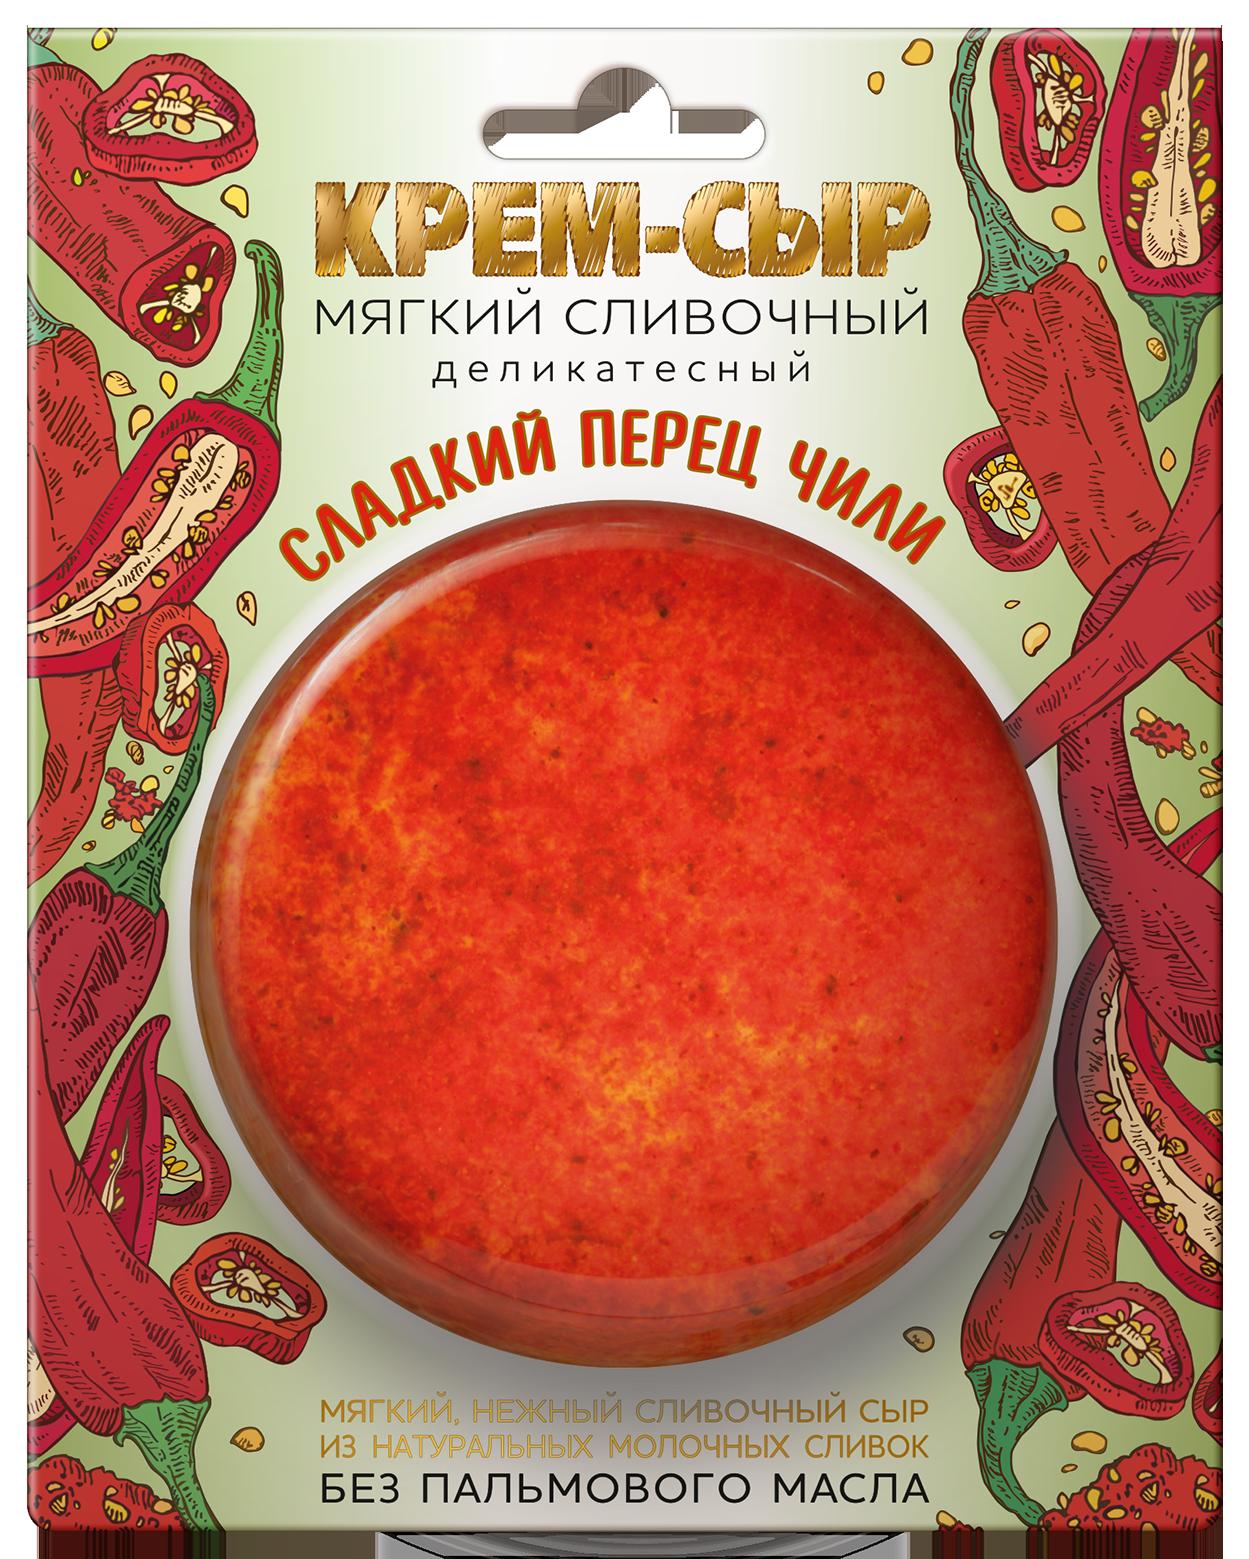 "Сыр мягкий сливочный ""СЛАДКИЙ ПЕРЕЦ ЧИЛИ"" 120г"